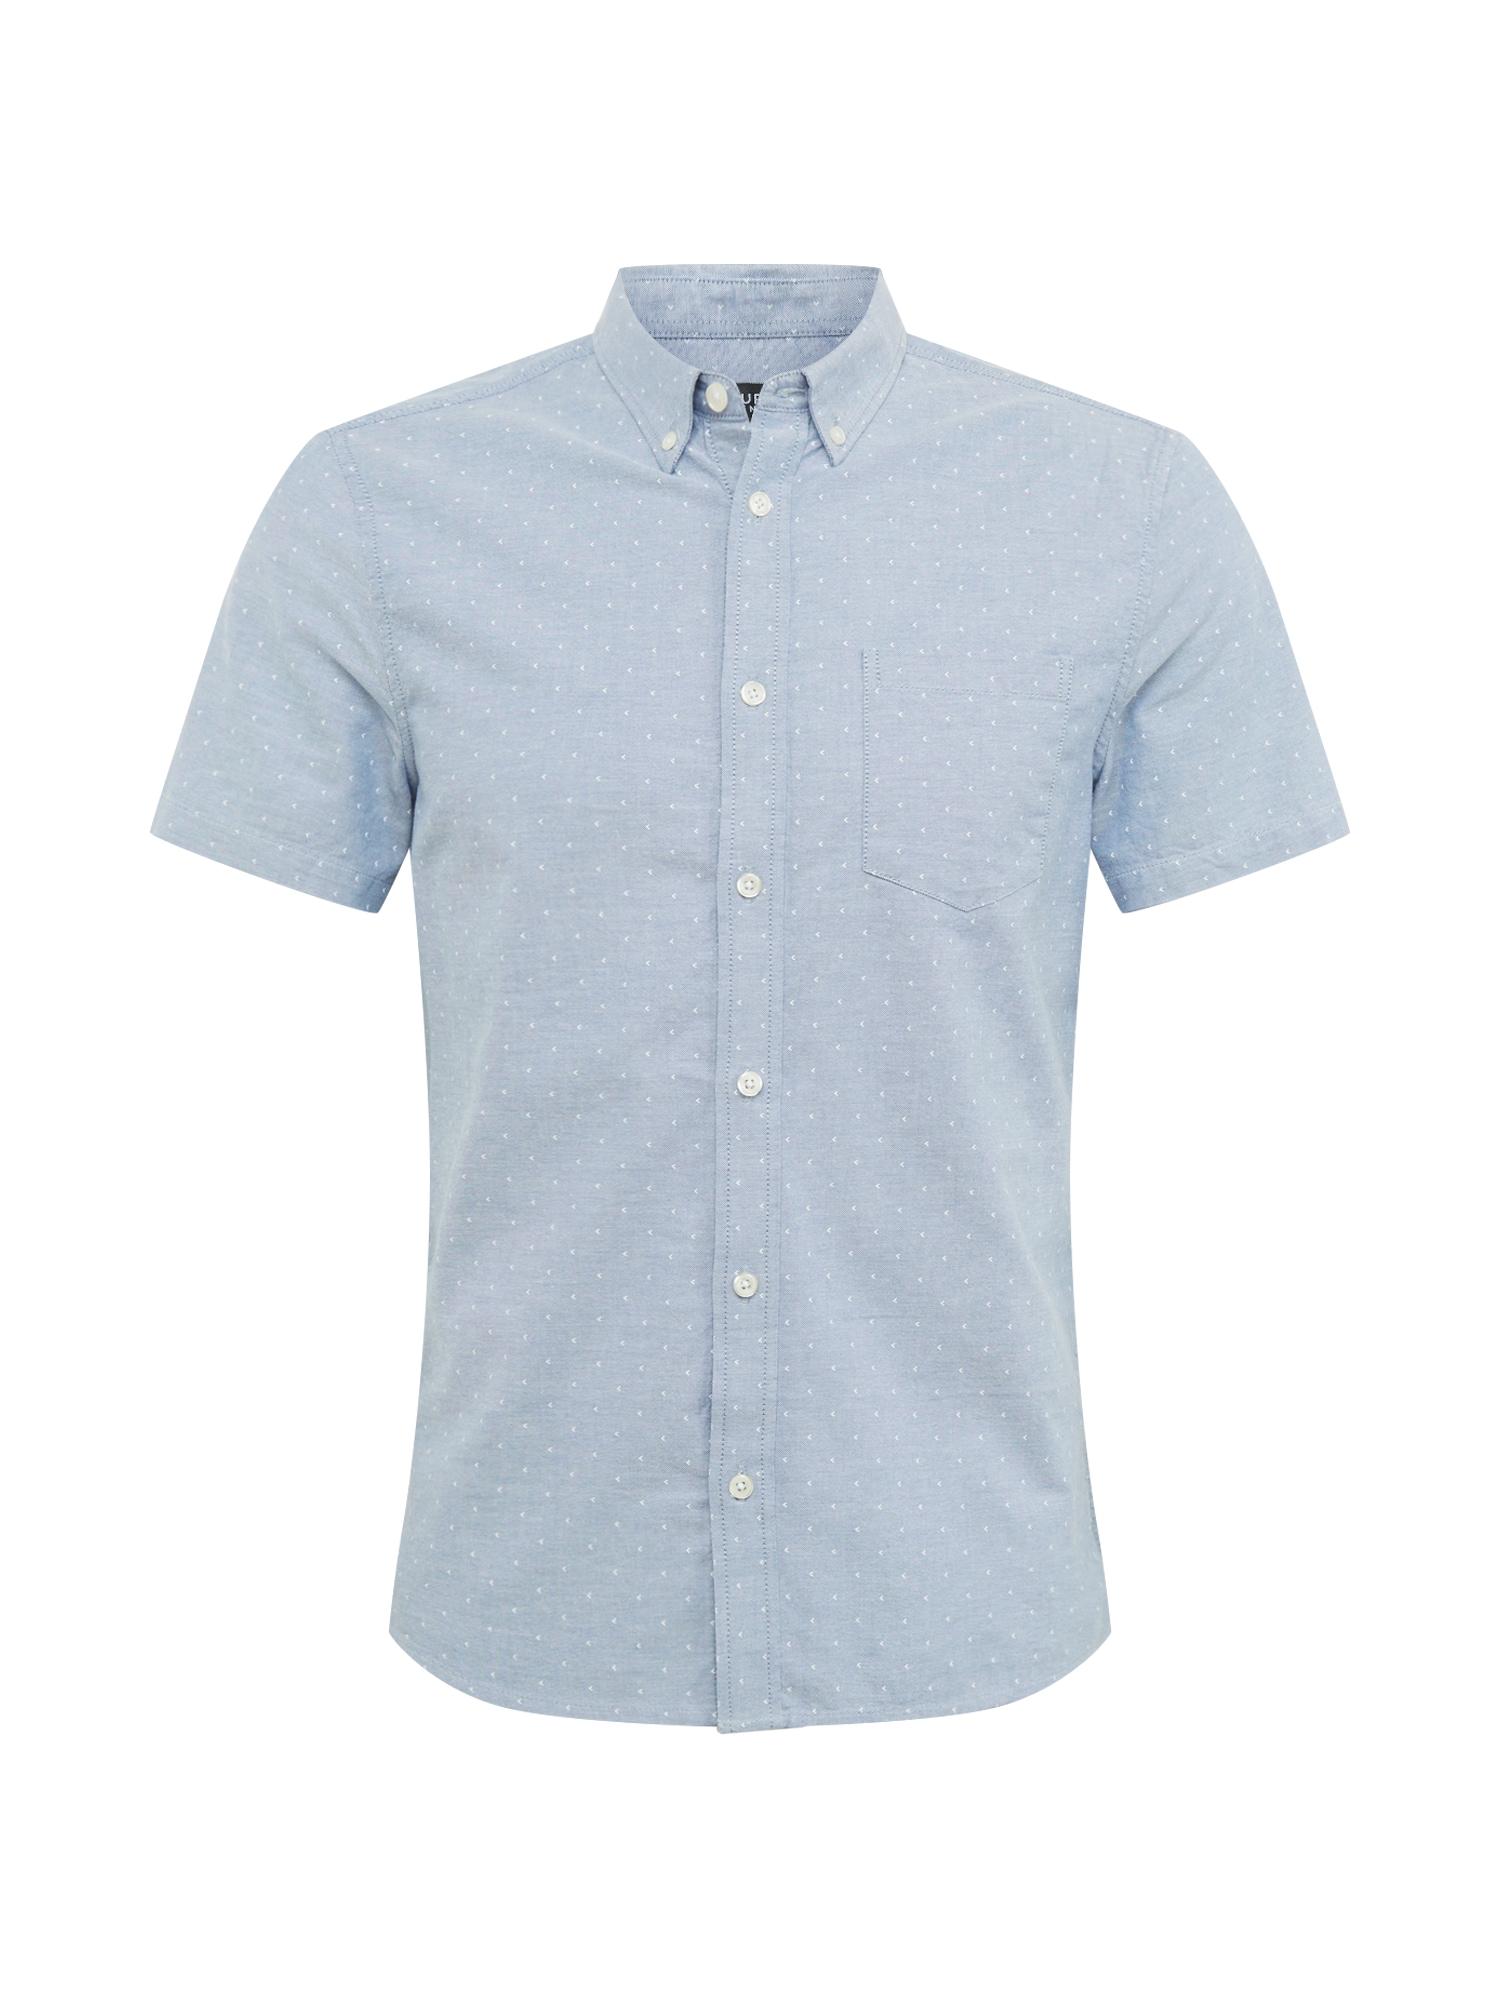 BURTON MENSWEAR LONDON Košeľa 'Oxford'  modré / biela